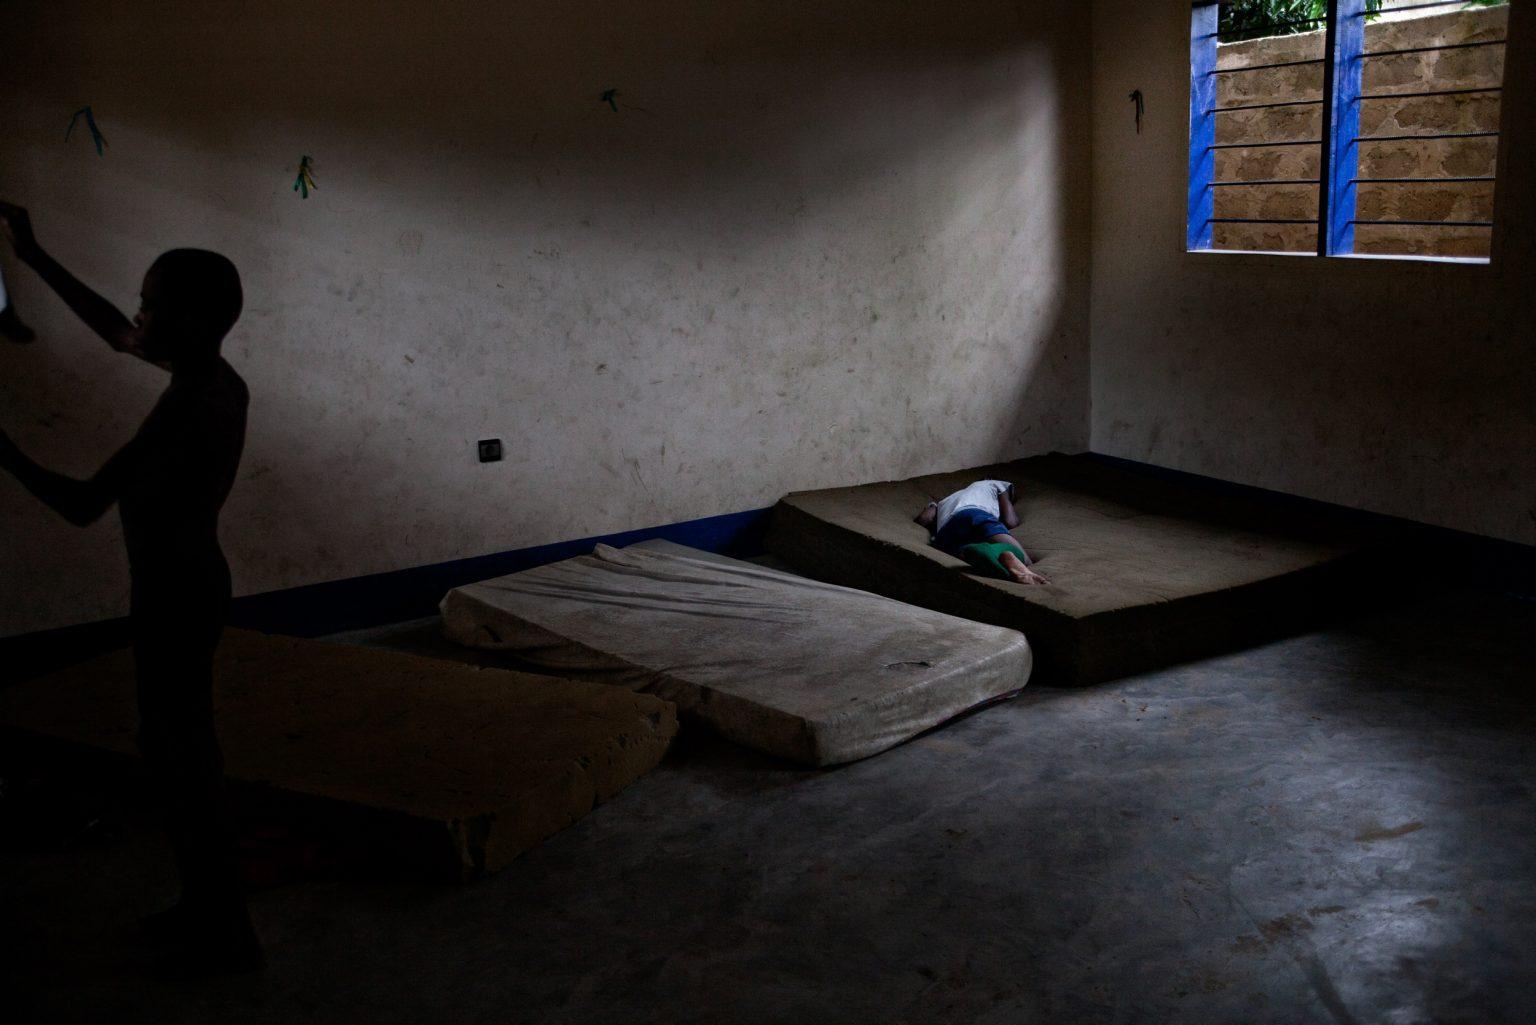 Ndako ya Biso Centre - Children in the room where children rest in the afternoon. Kinshasa, Democratic Republic of the Congo, 2011